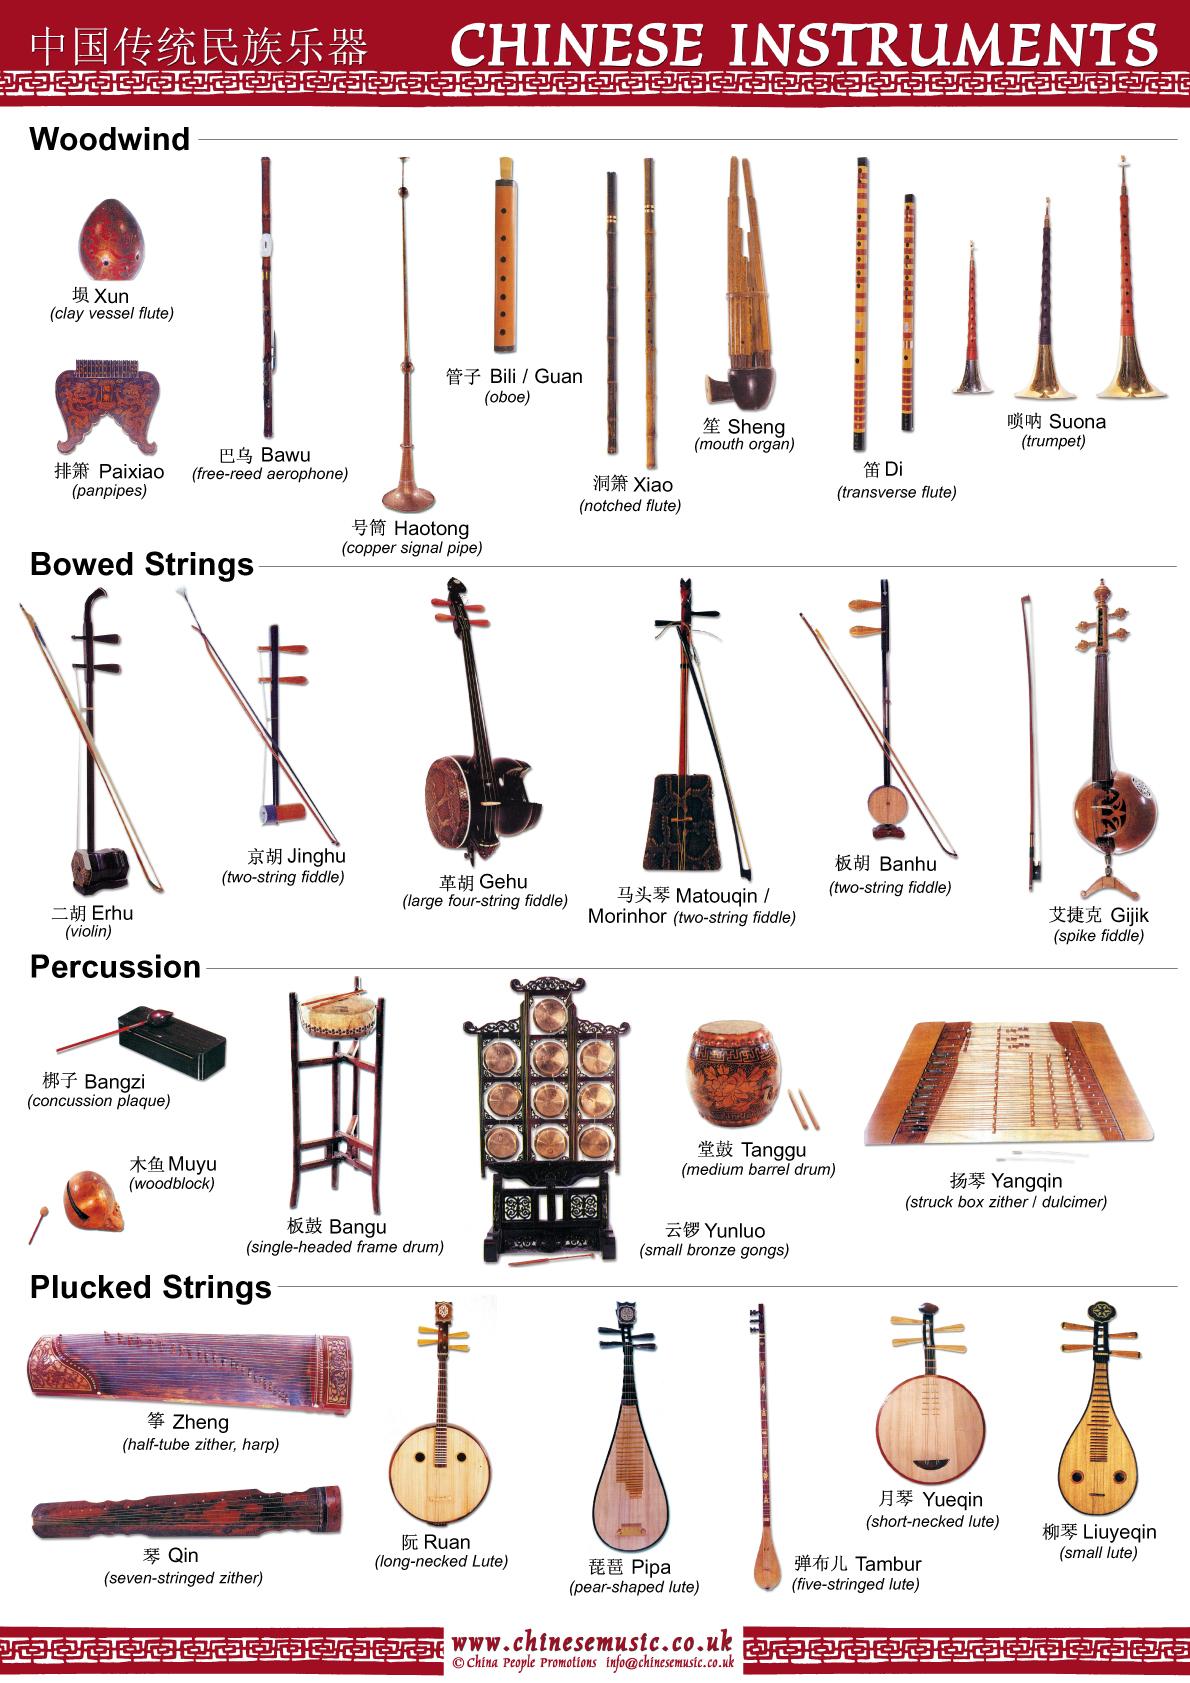 Kwang Jiab Sia The Chinese Instruments Shop